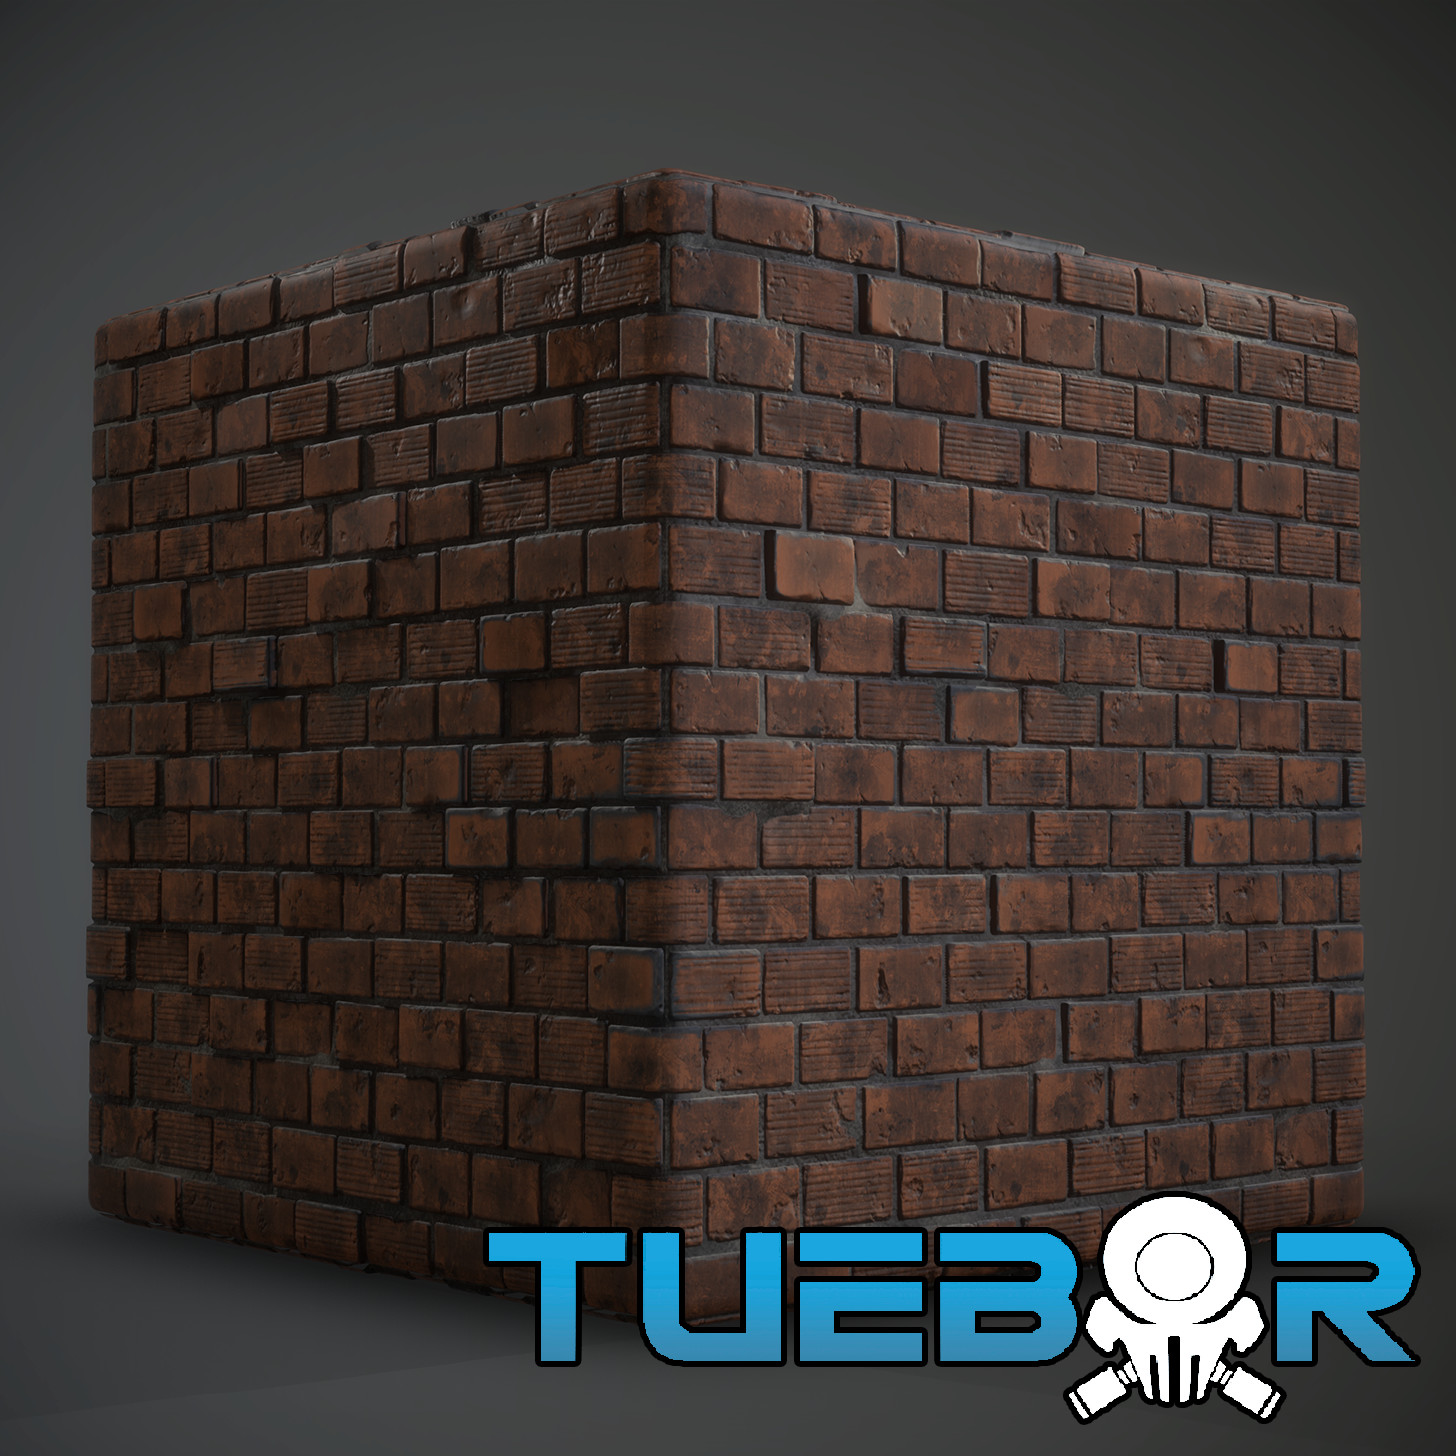 Tuebor - Tiling Materials